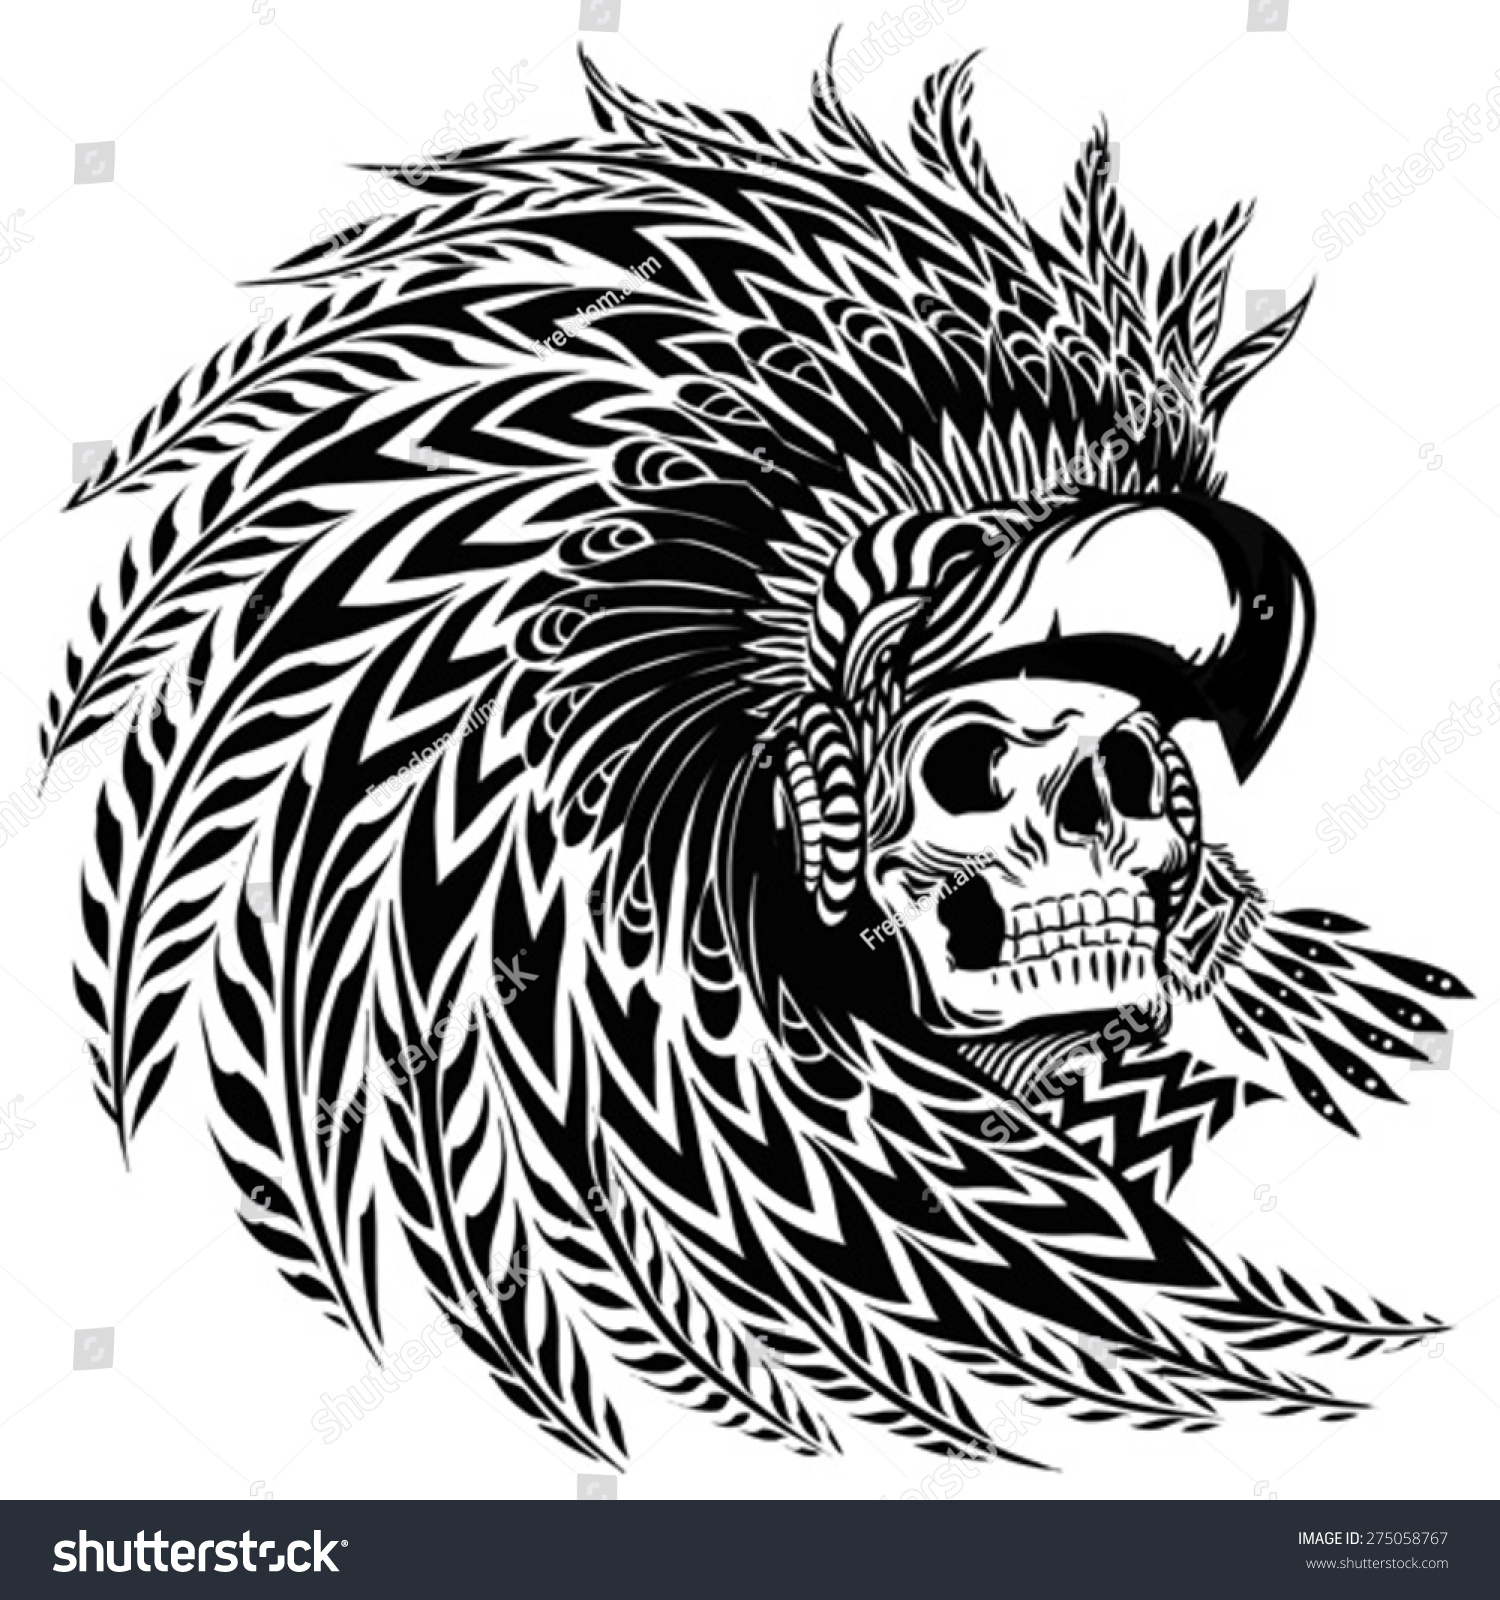 Tattoo aztec warrior stock vector 275058767 shutterstock for Aztec mural tattoos